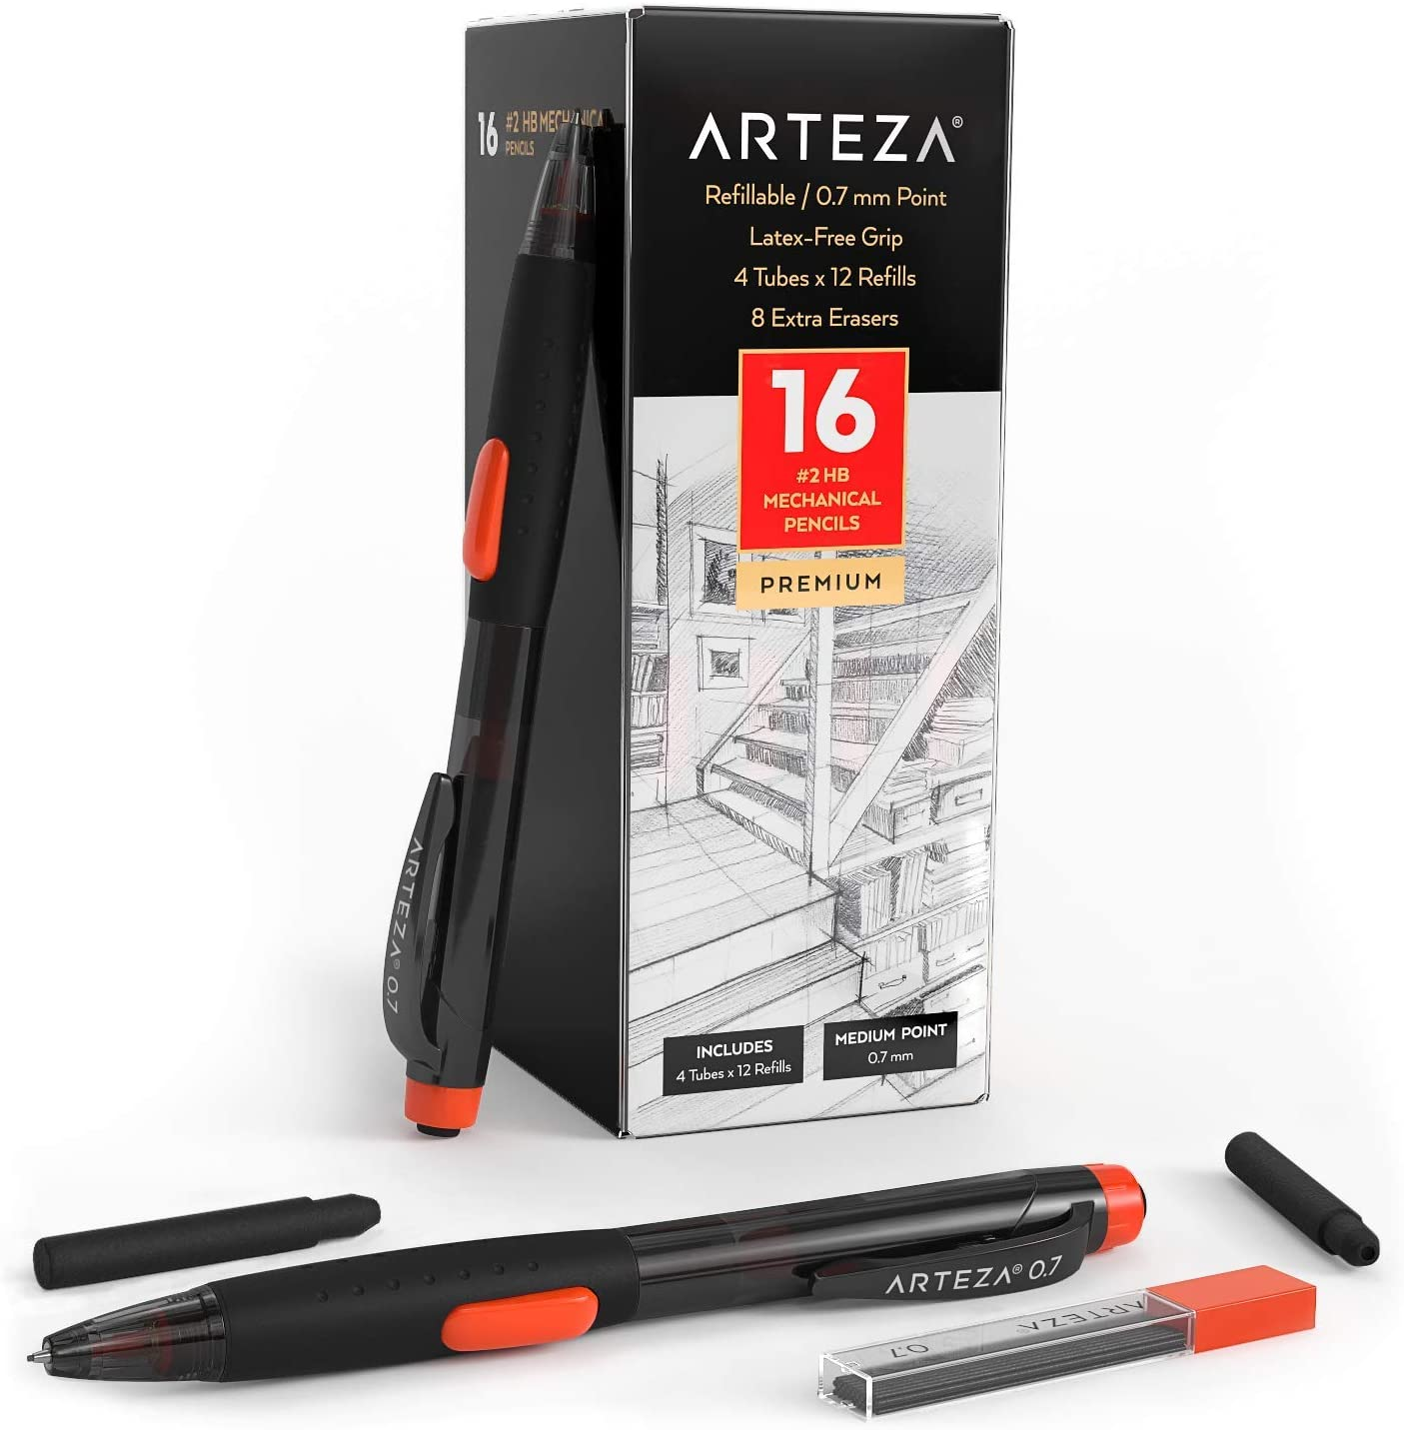 Arteza NEW HB Mechanical Pencil Pack of Medium Manufacturer OFFicial shop Po 16 Millimeter 0.7